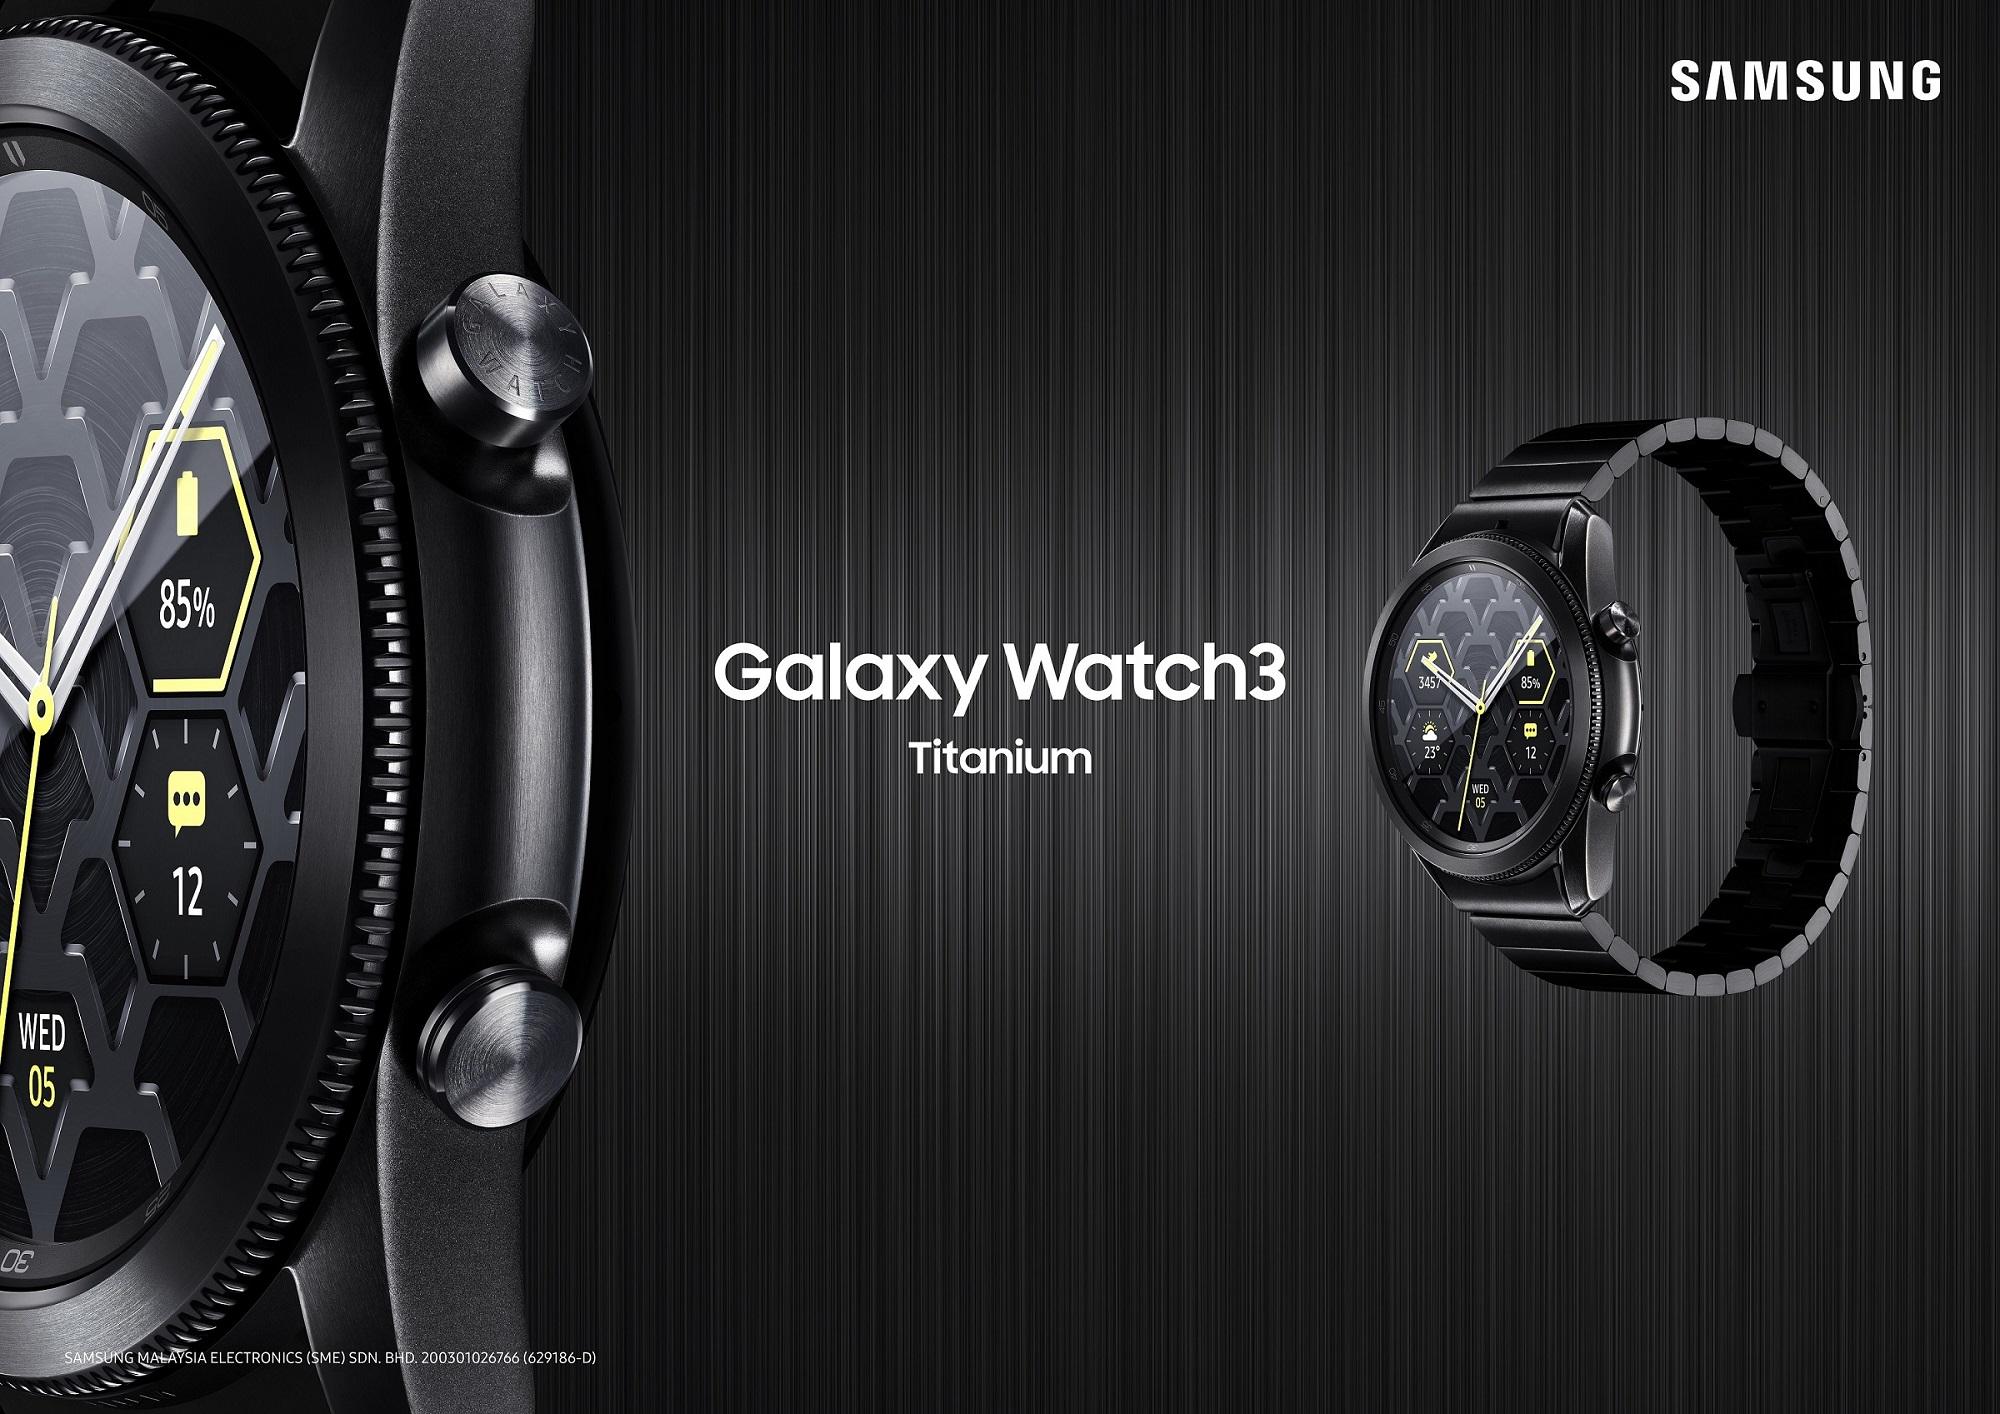 Samsung Launches Galaxy Watch3 Titanium - Merging Luxury with Durability